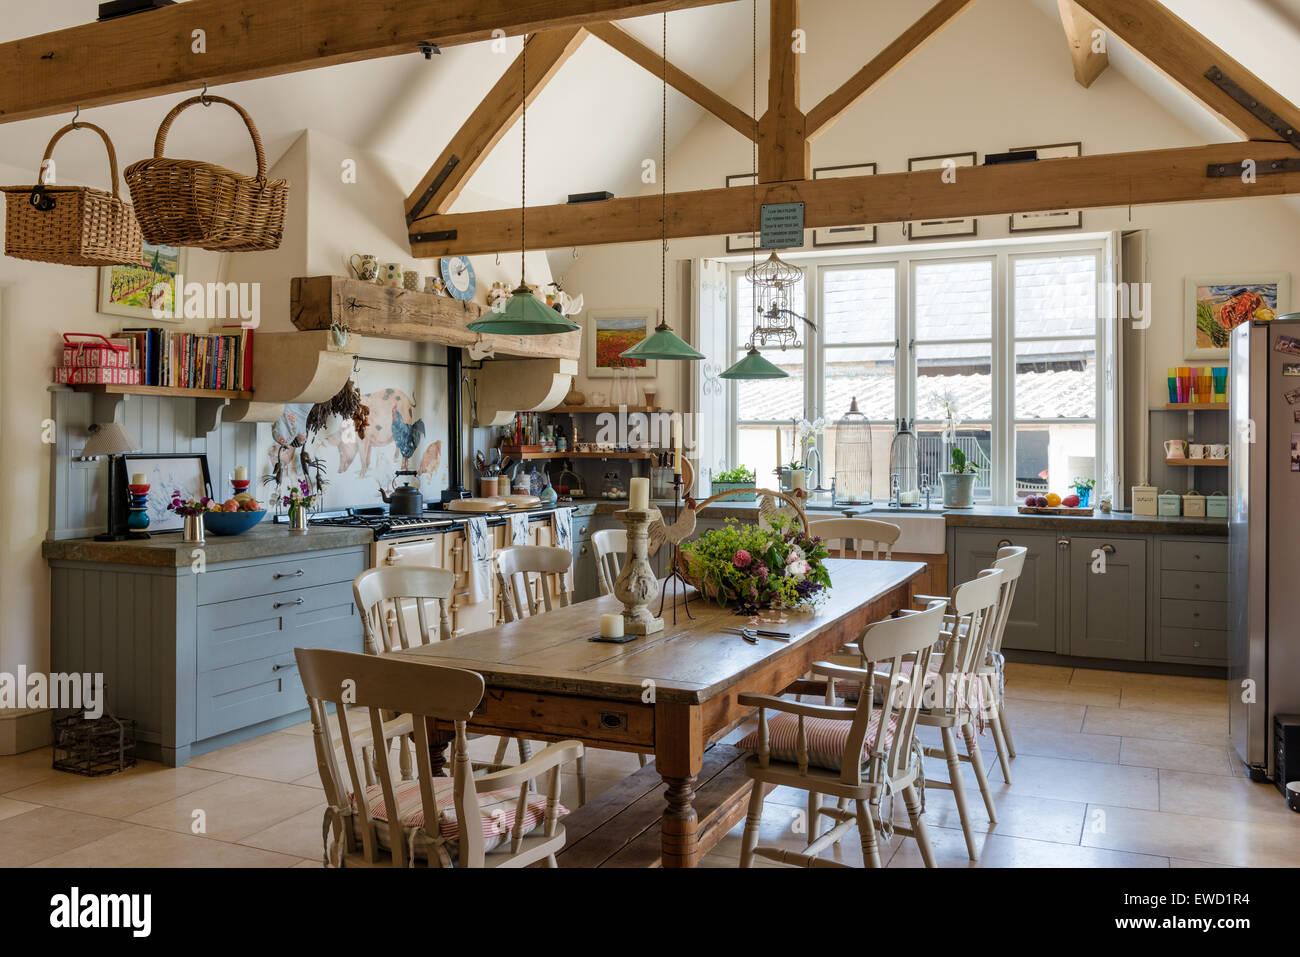 Agriturismo vintage tavola in cucina rustica con verde le for Cucine in stock